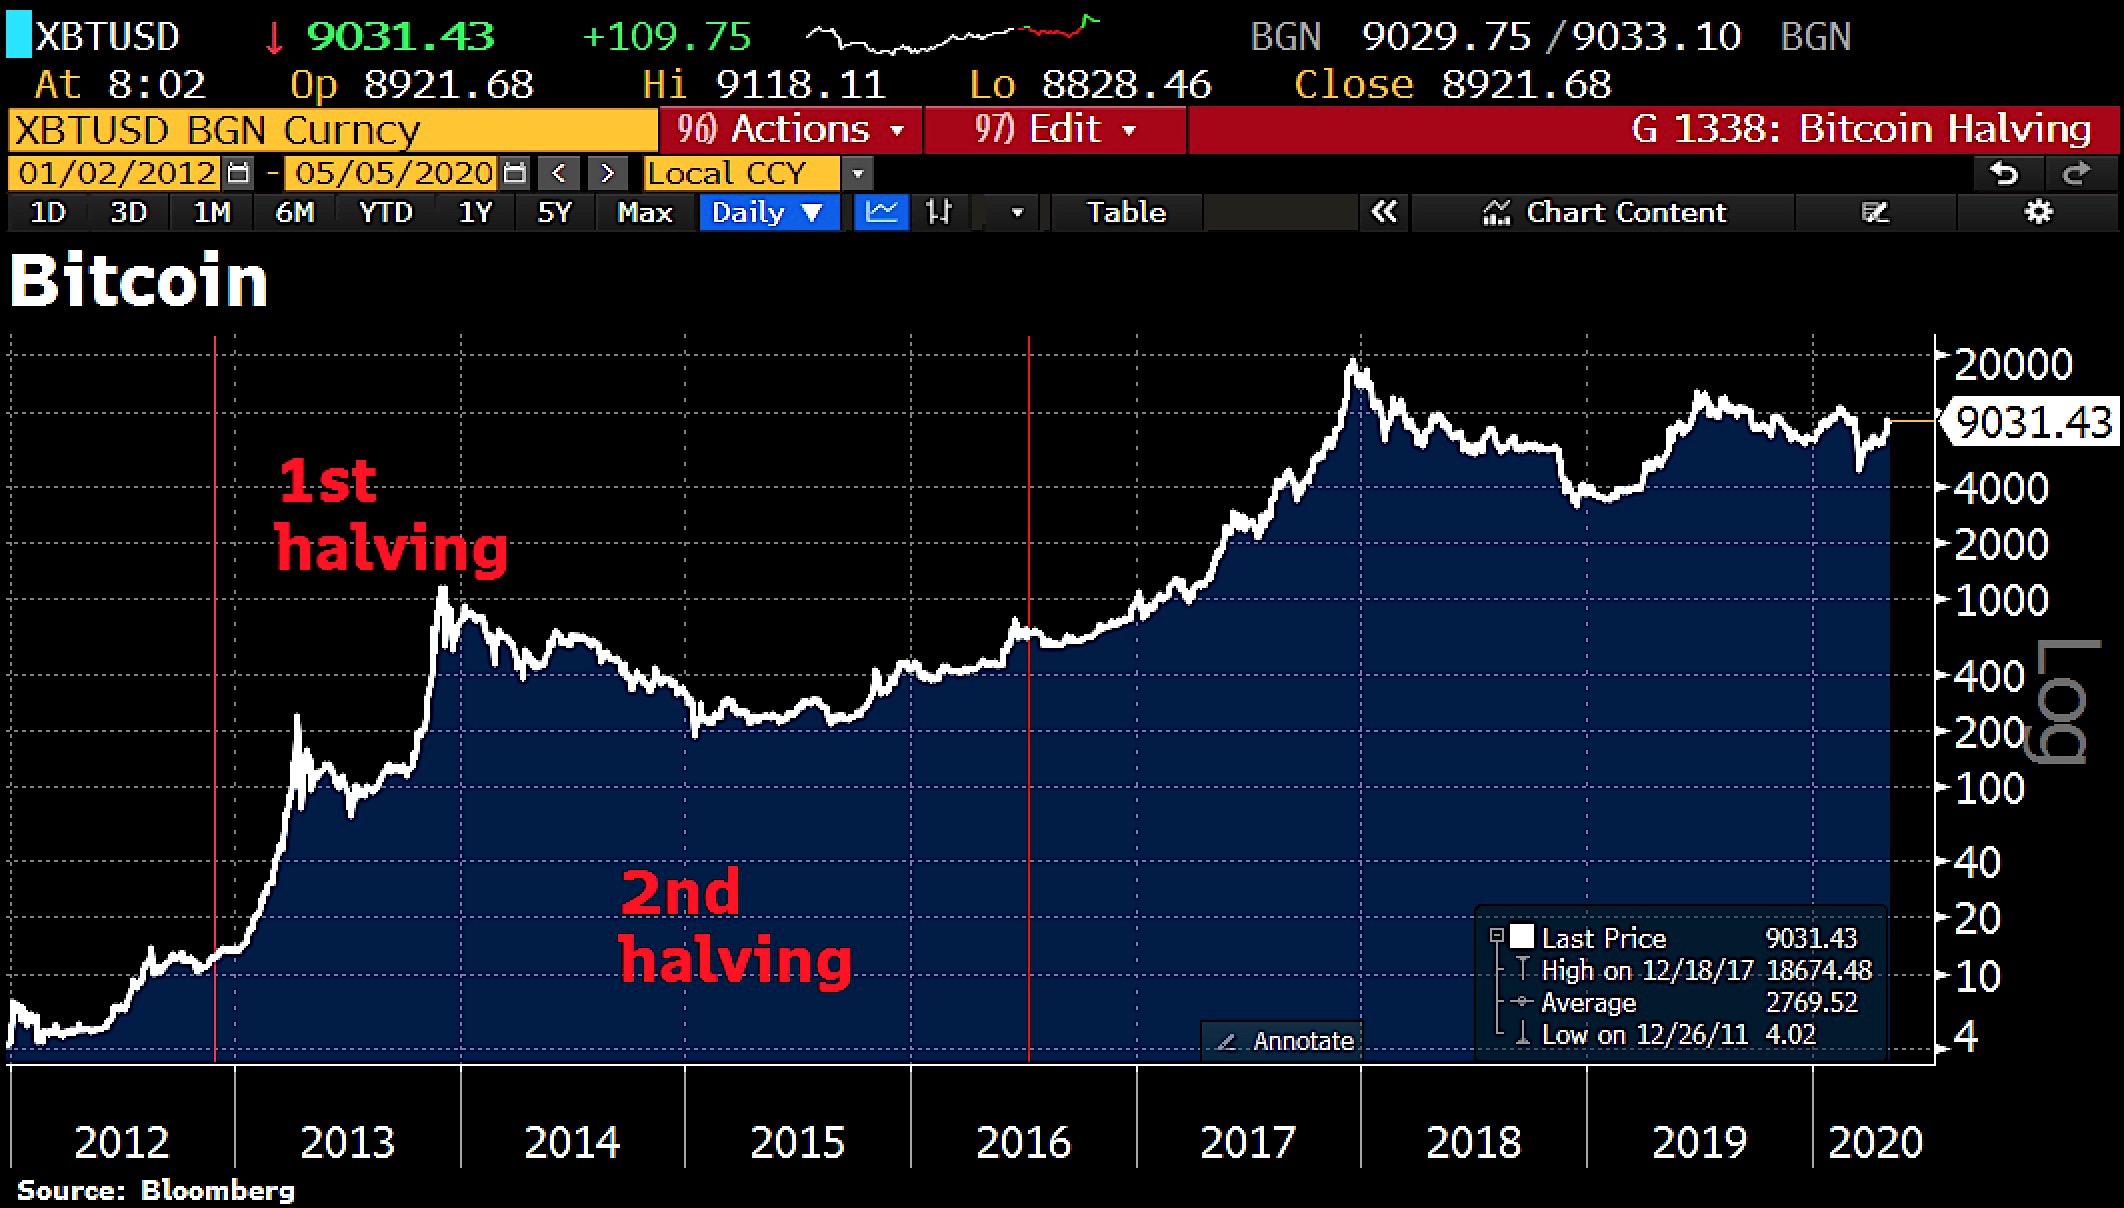 © Holger Zschaepitz @Schuldensuehner, 5th of May 2020, Bitcoin - Breakout In Progress